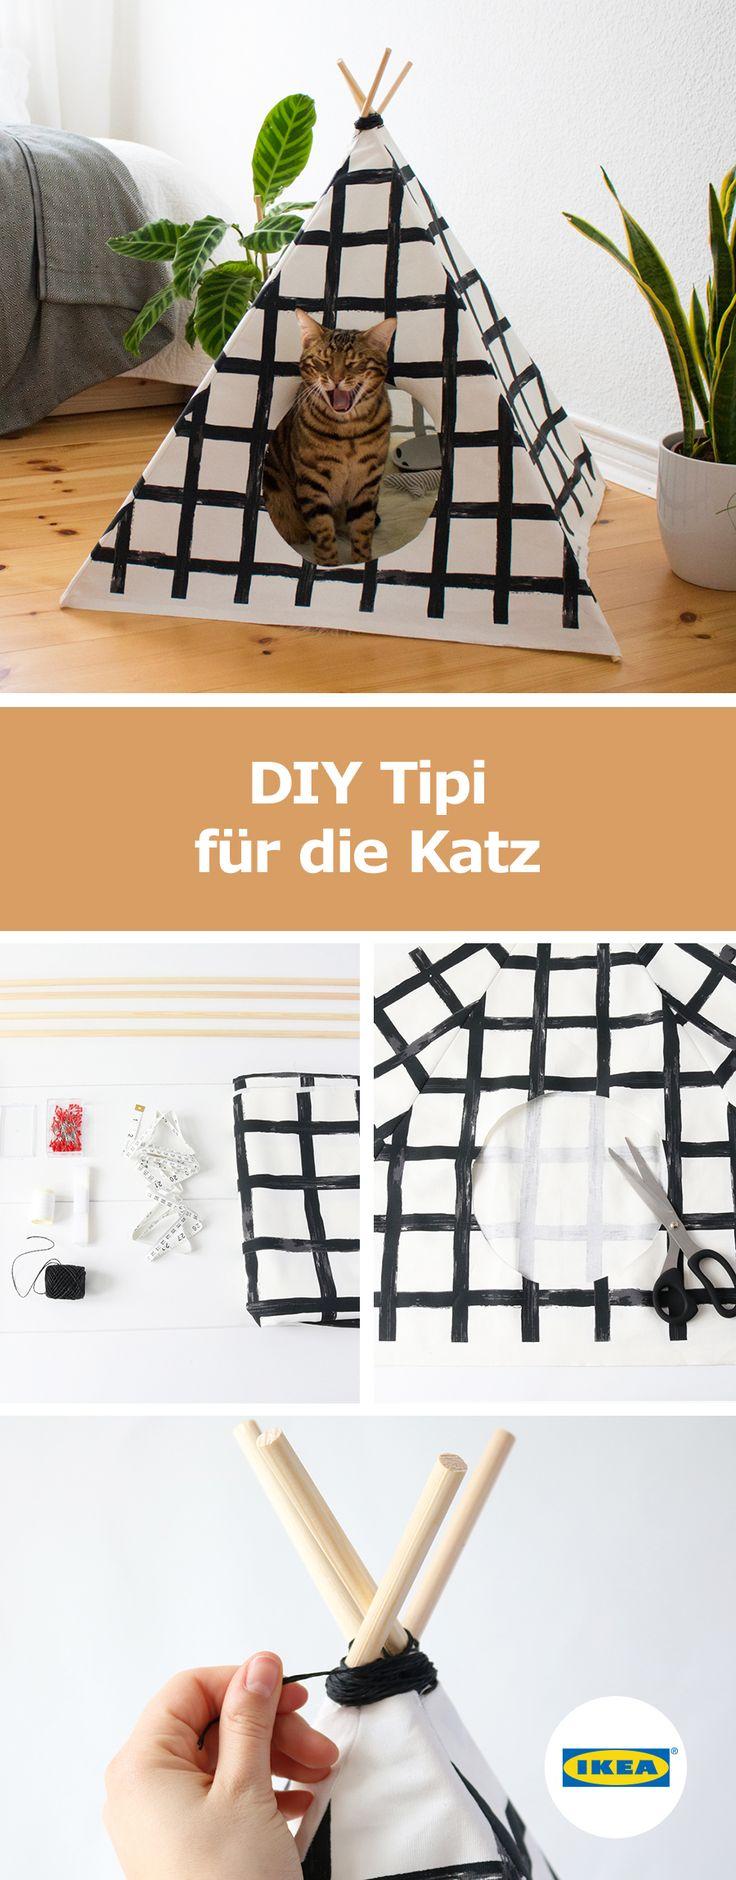 40 besten ikea diy ideen bilder auf pinterest ikea. Black Bedroom Furniture Sets. Home Design Ideas